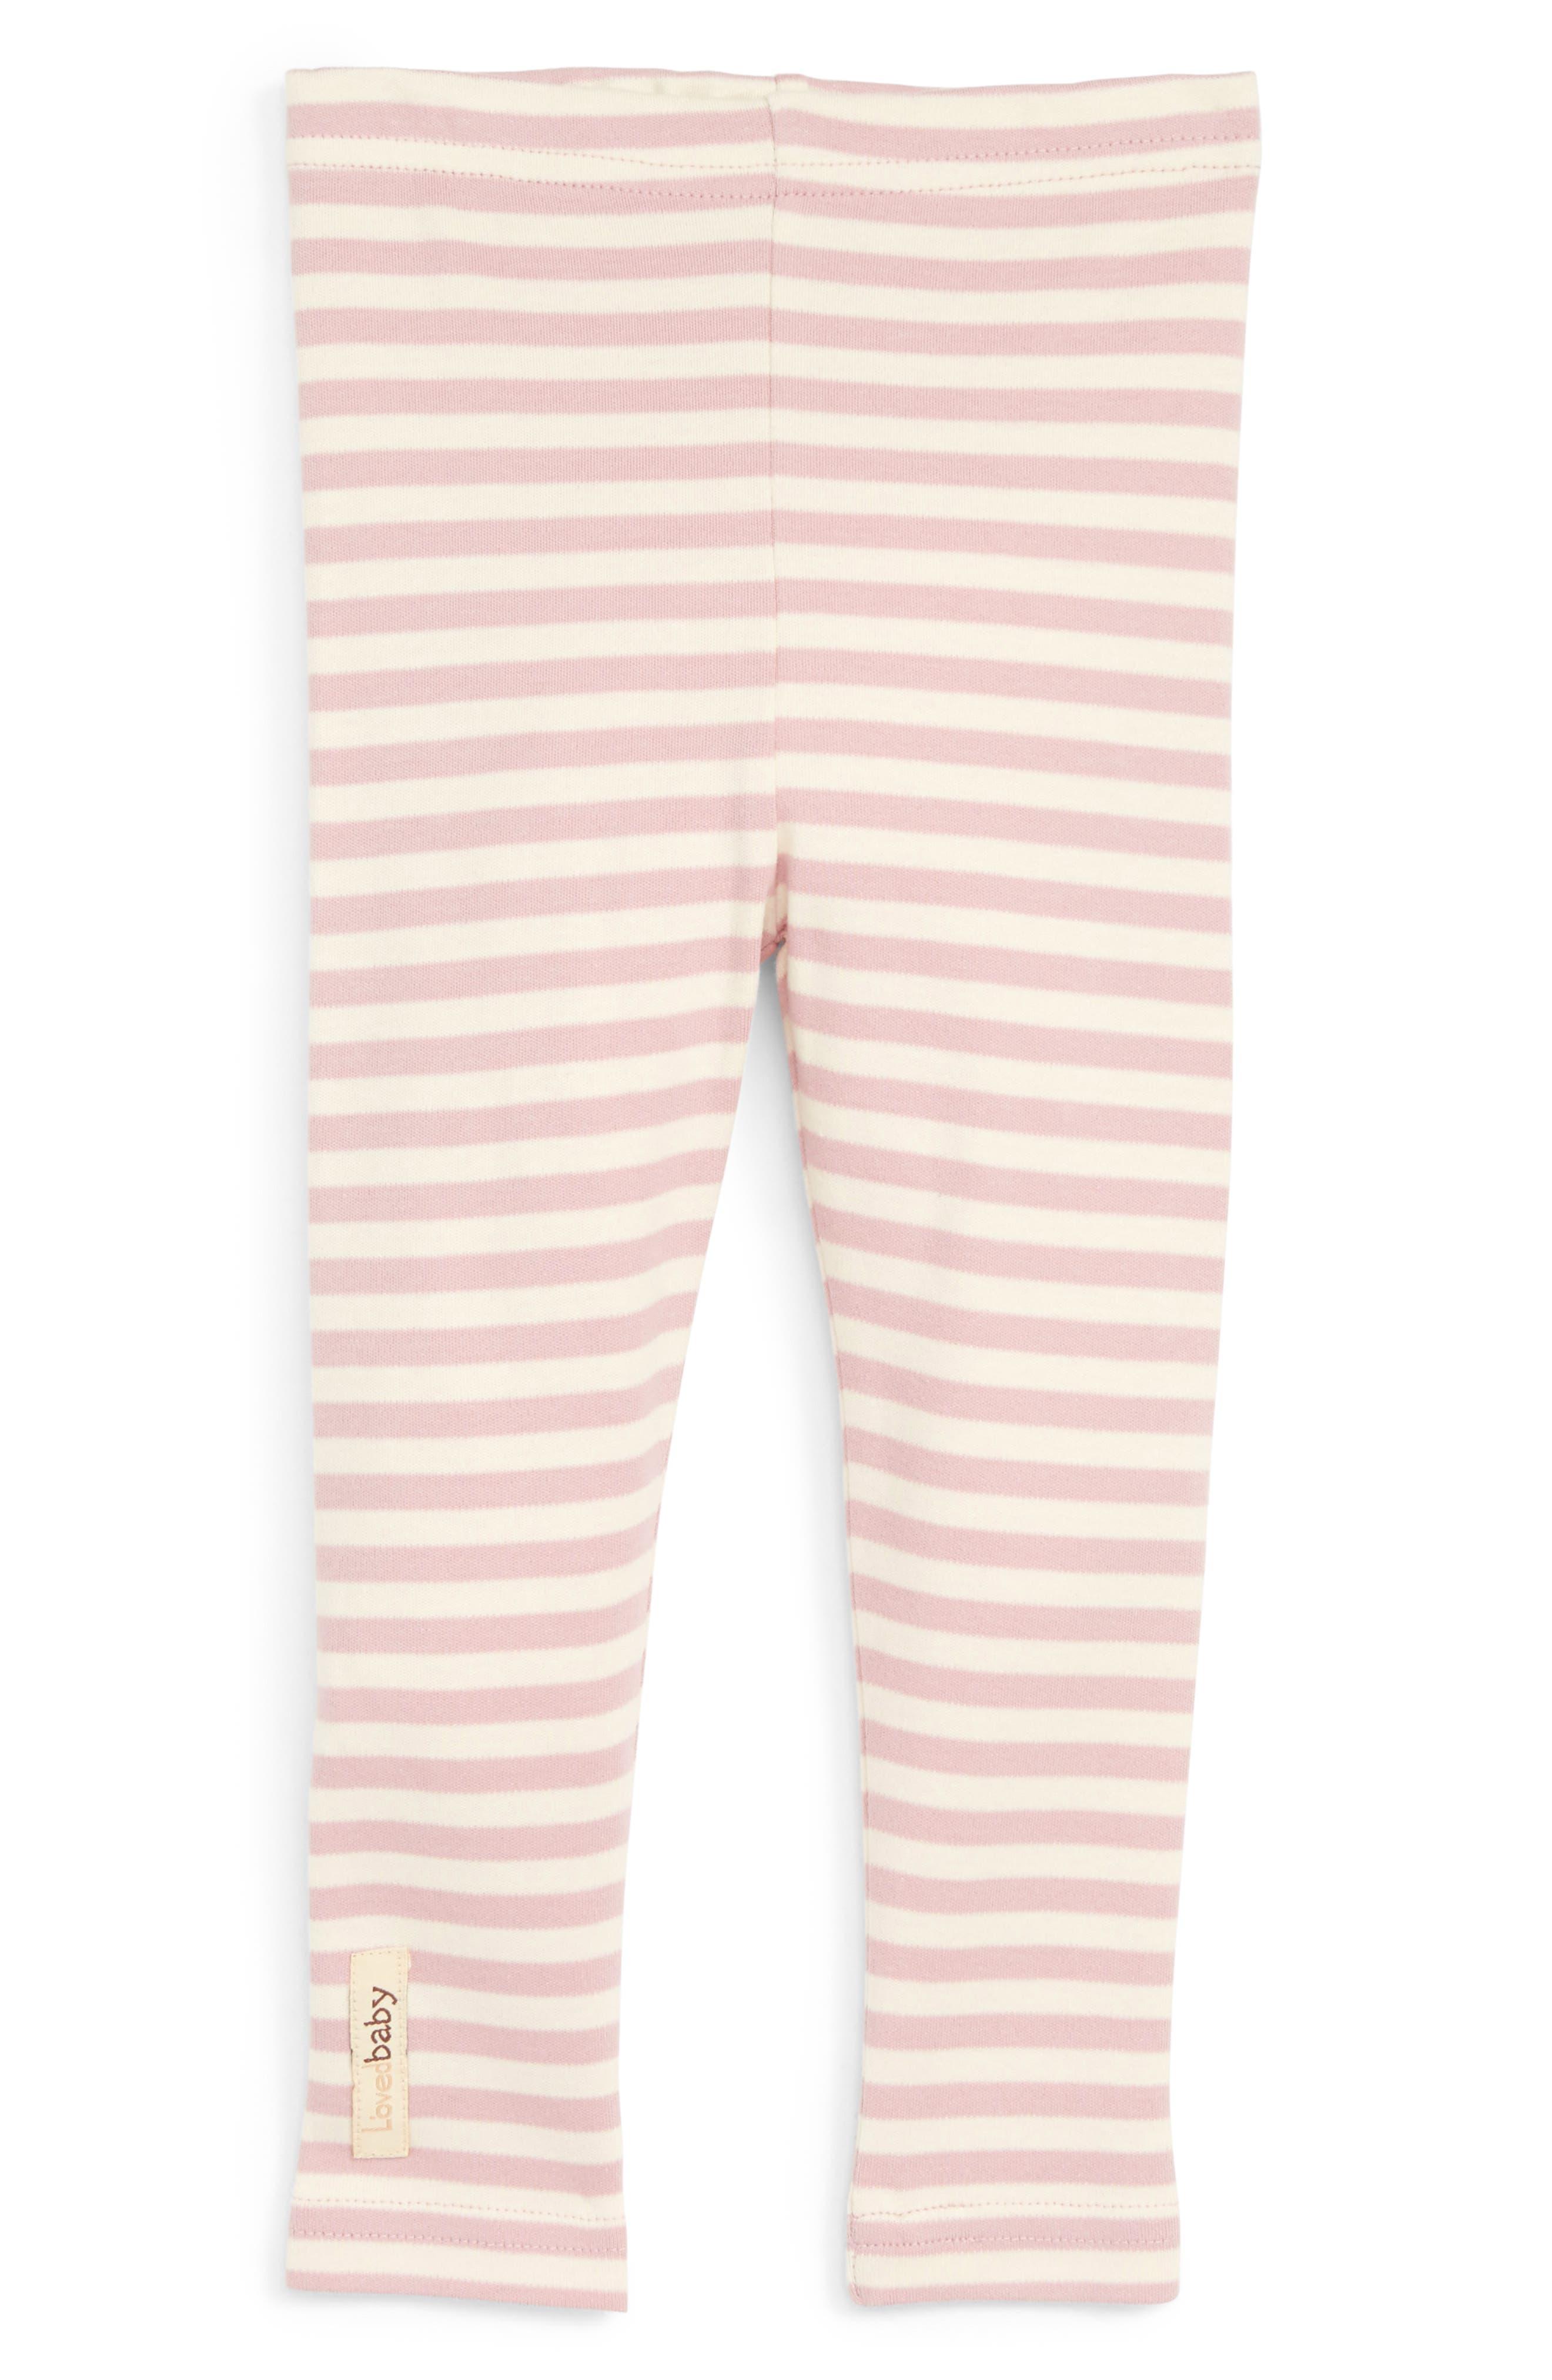 Main Image - L'ovedbaby Organic Cotton Leggings (Baby)